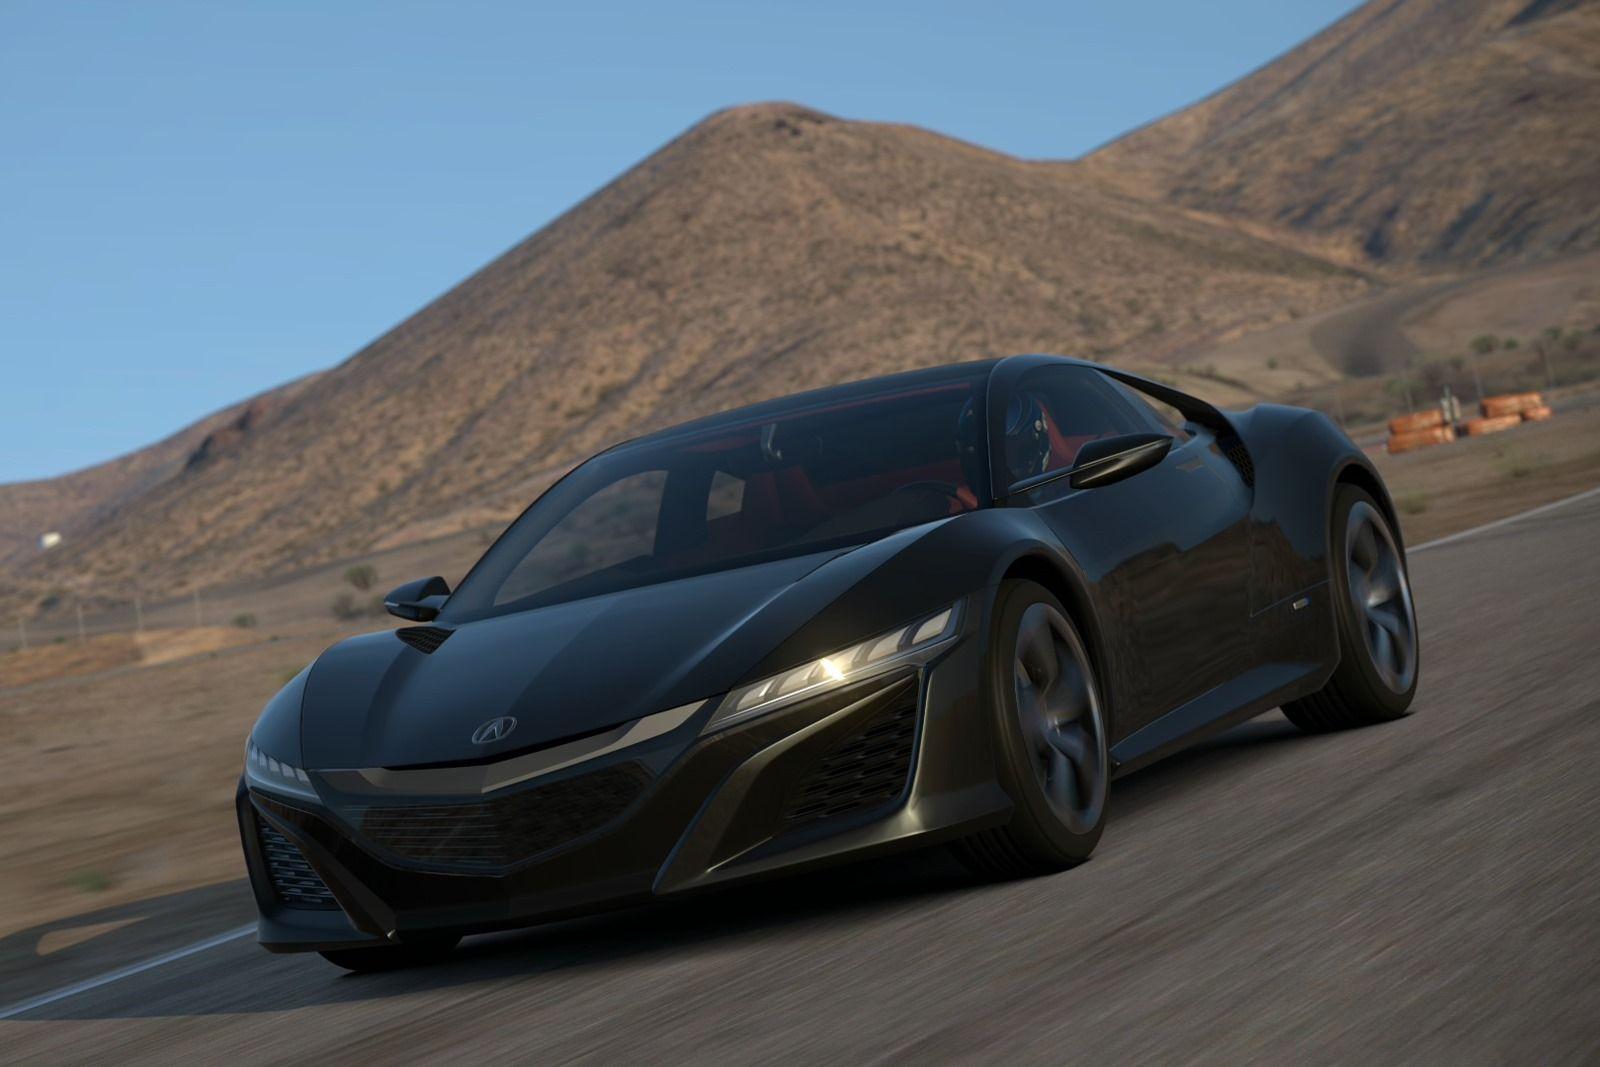 Surprise Today 8217 S Gran Turismo 6 Release Includes The Acura Nsx Concept  Picture